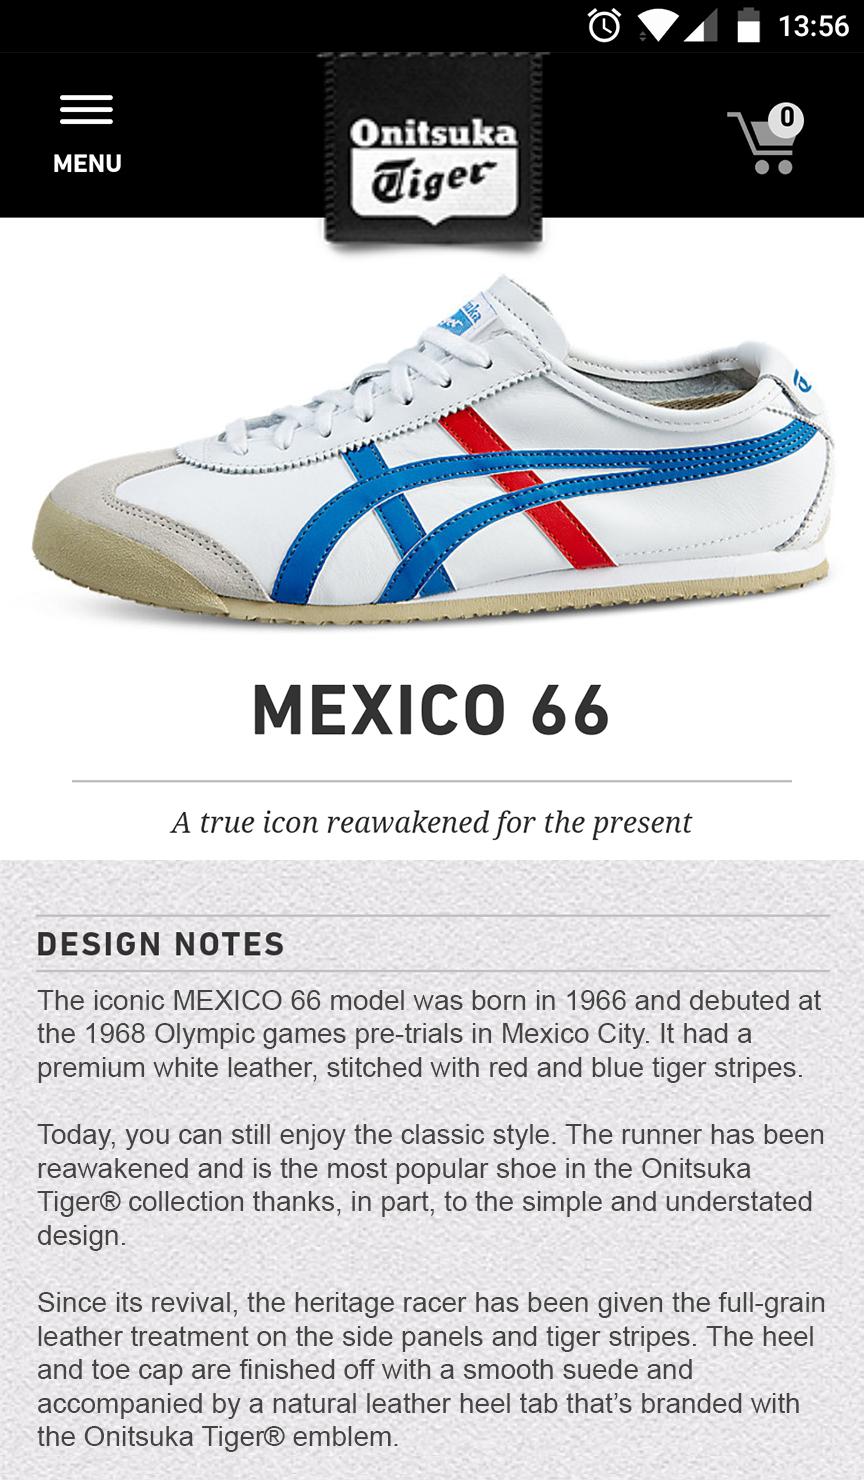 Mexico 66 screenshot